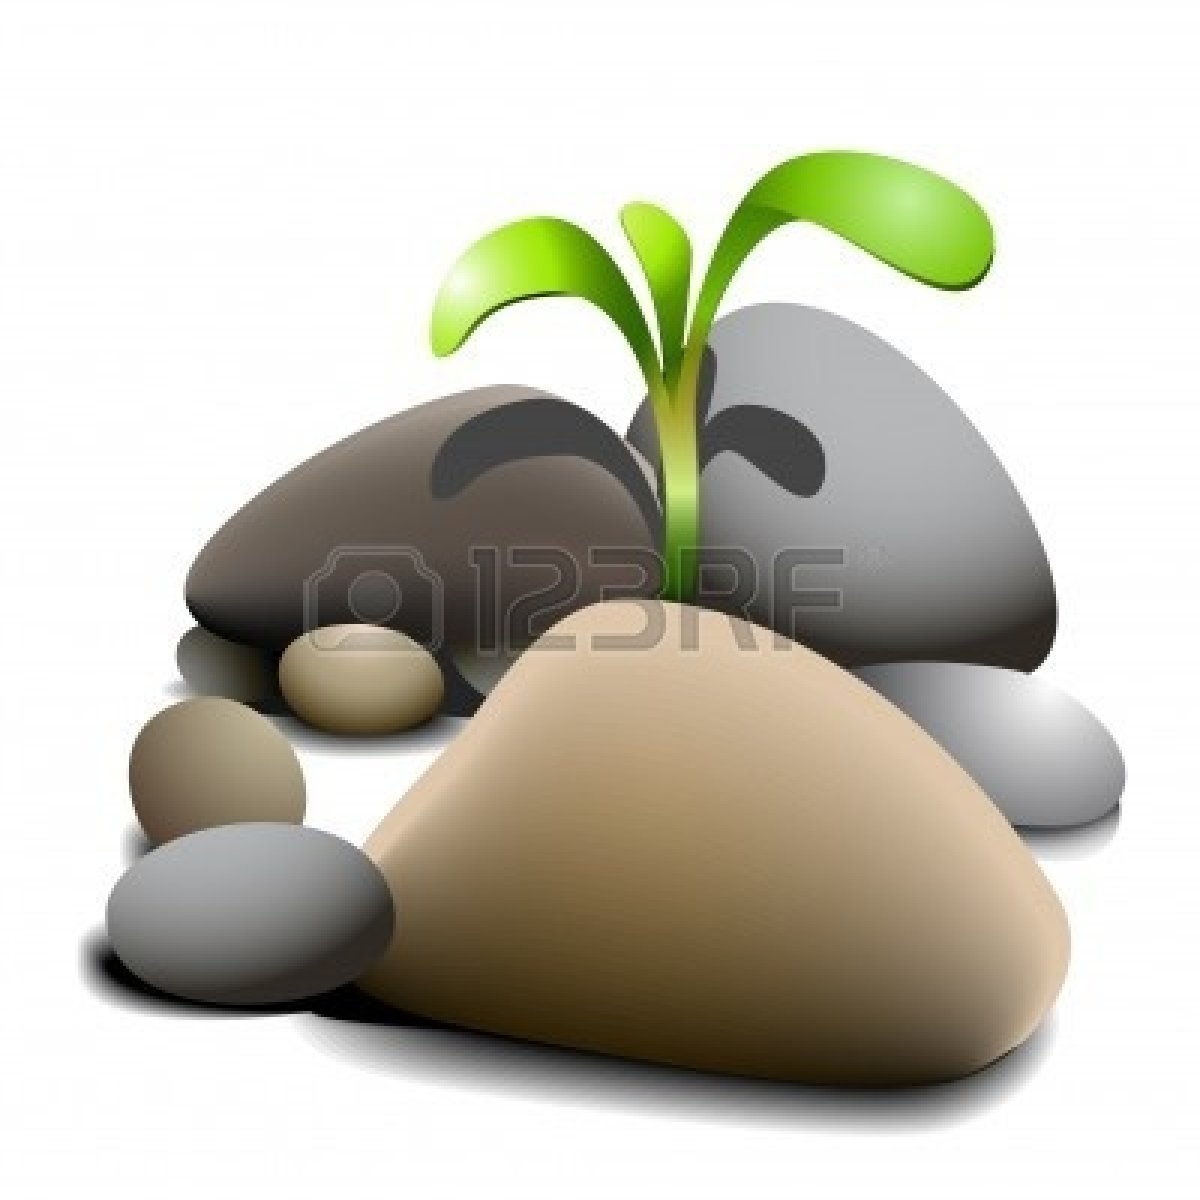 Stone Clip Art : Stone clipart panda free images